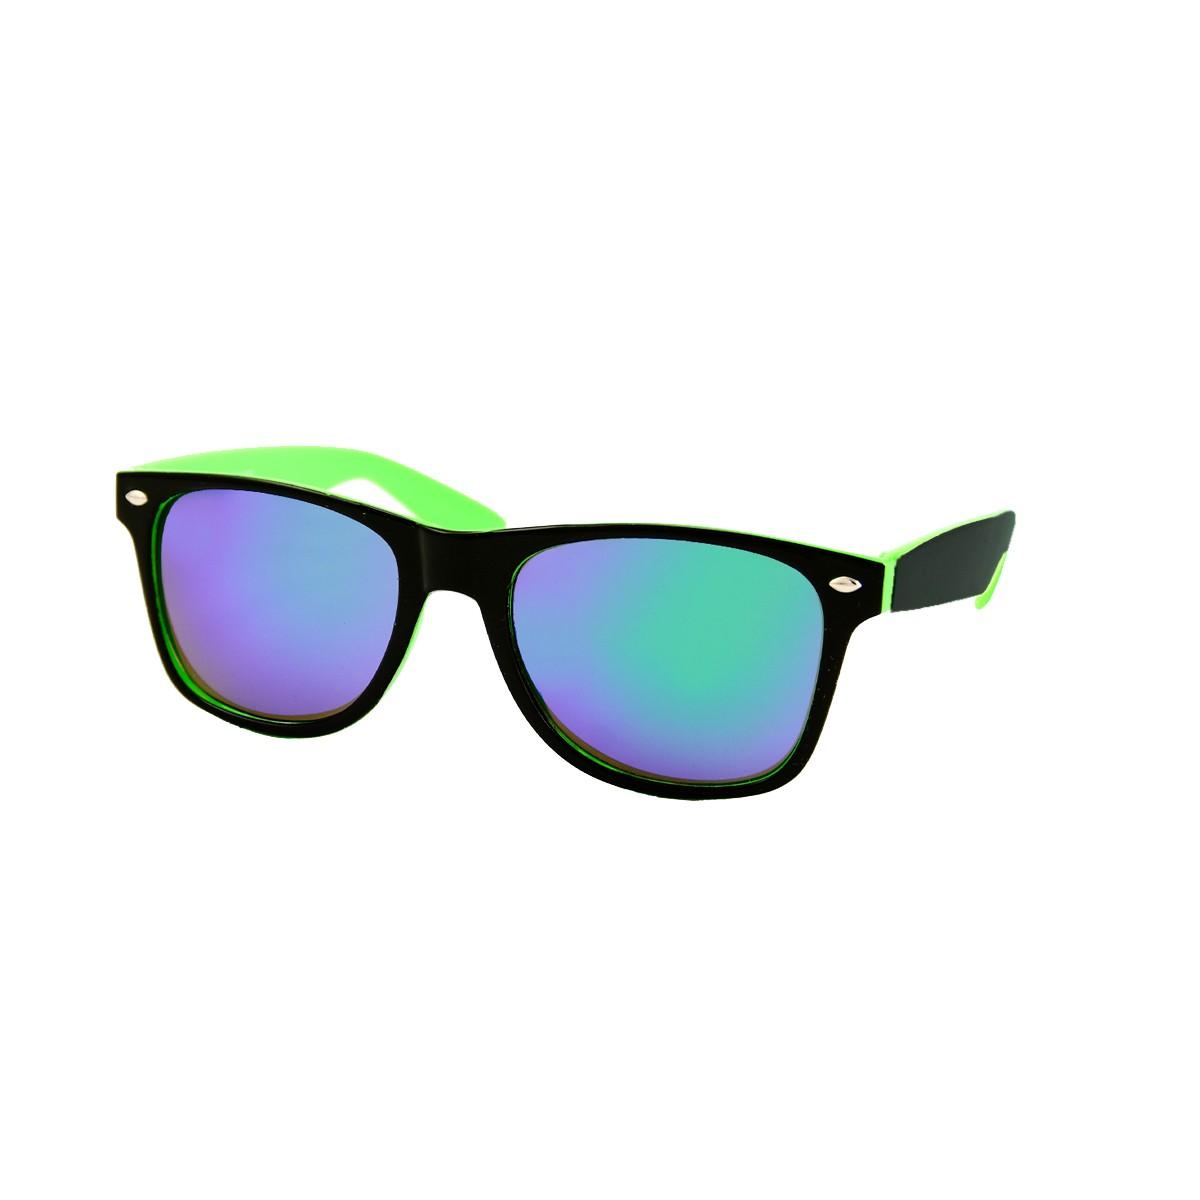 Two tone wayfarer zonnebril zwart groen - paars blauw spiegelglas